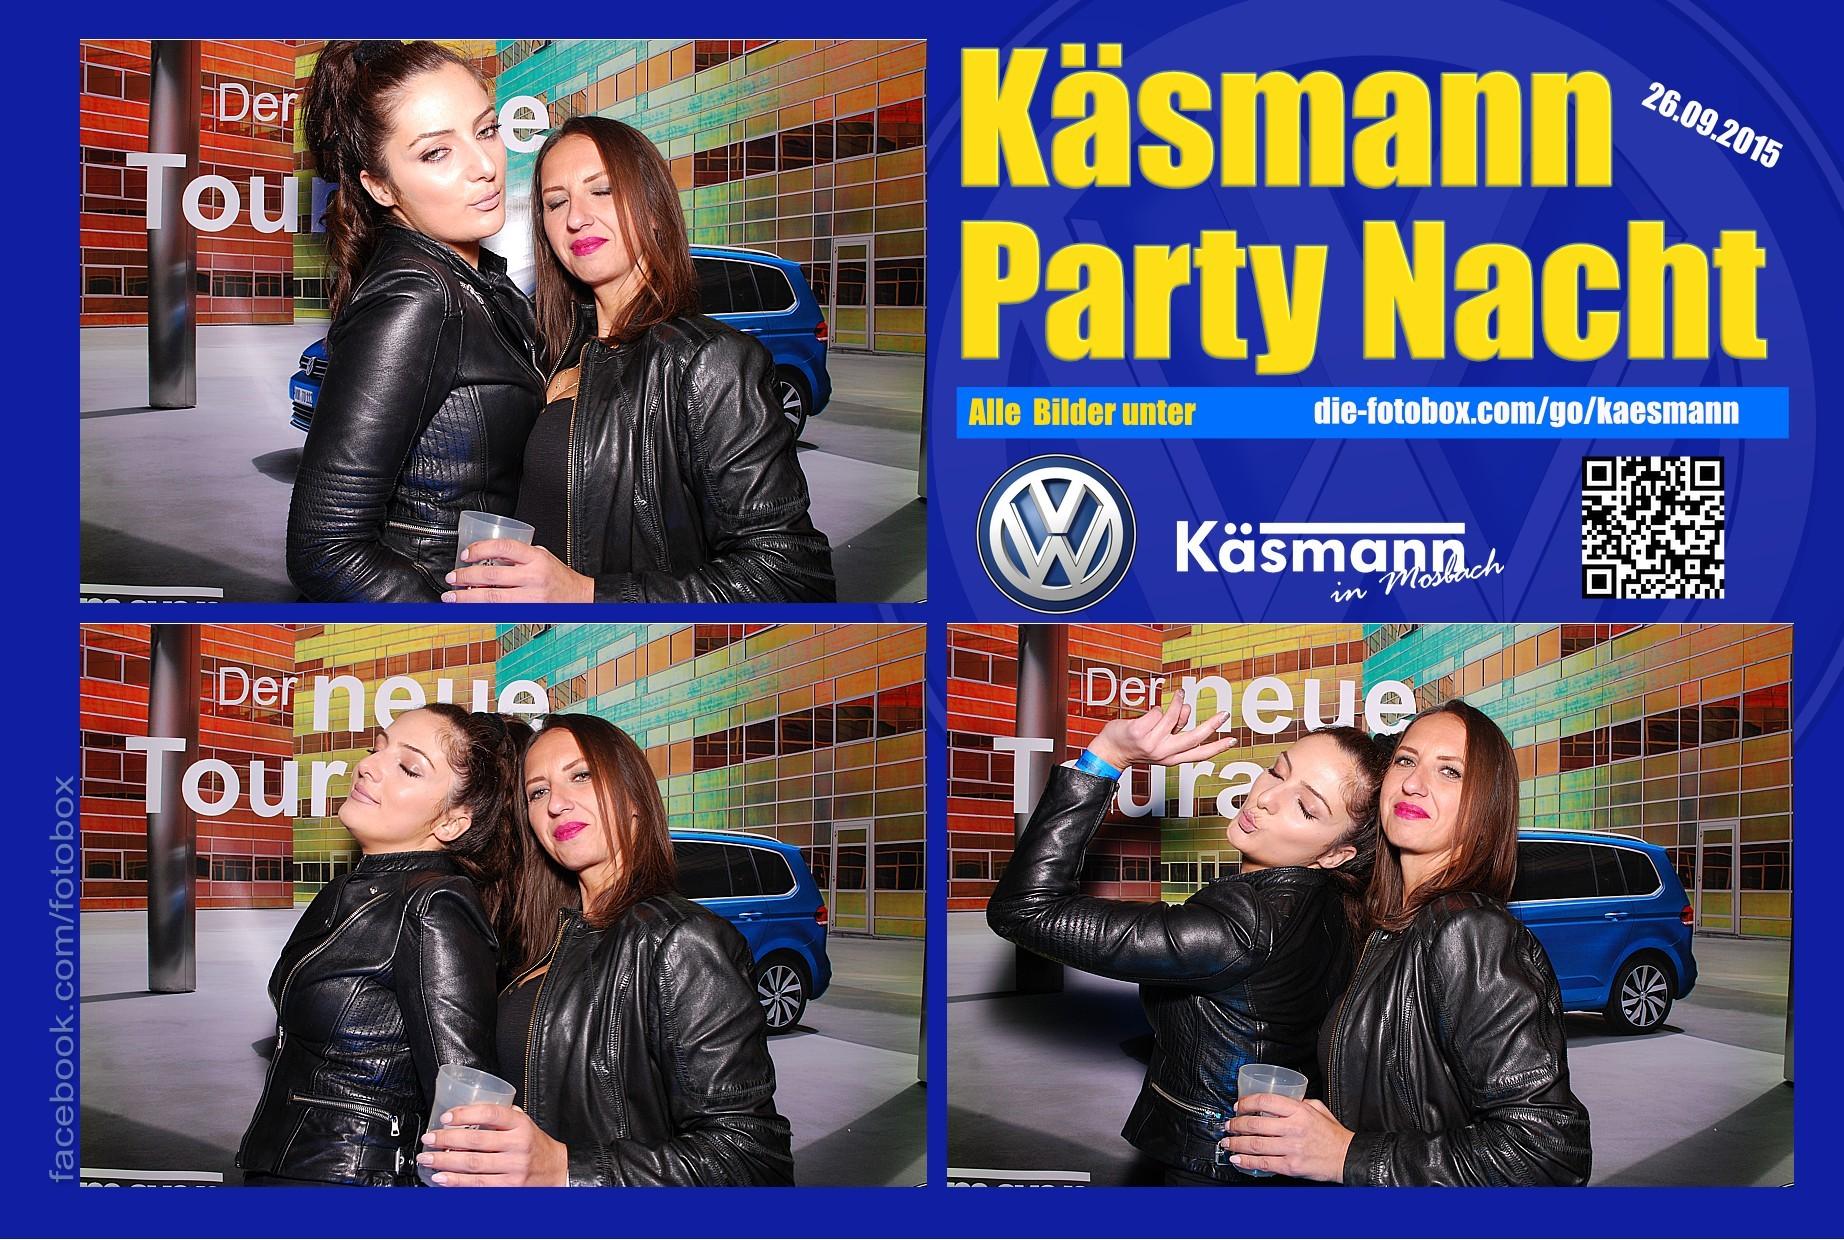 Käsmannparty 2015 - www.die-fotobox.com 01088